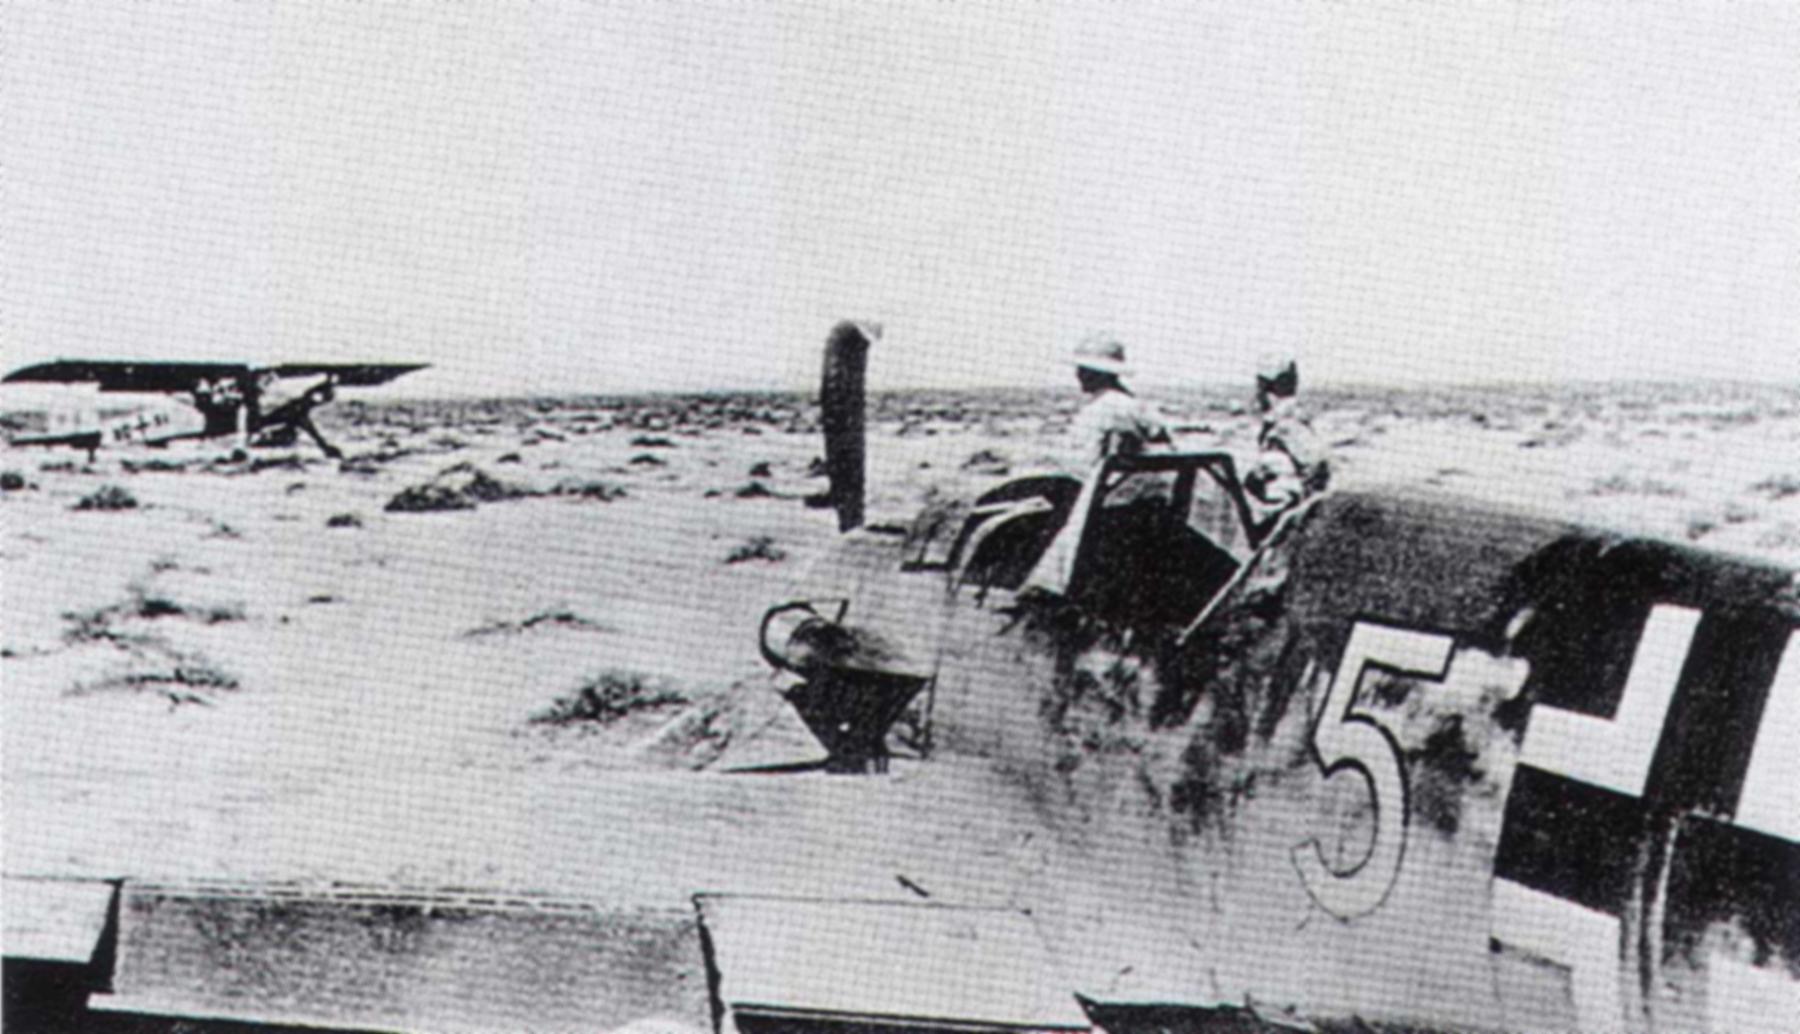 Messerschmitt Bf 109F4Trop 1.JG27 White 5 Albert Espenlaub crash landed El Adem 1941 01